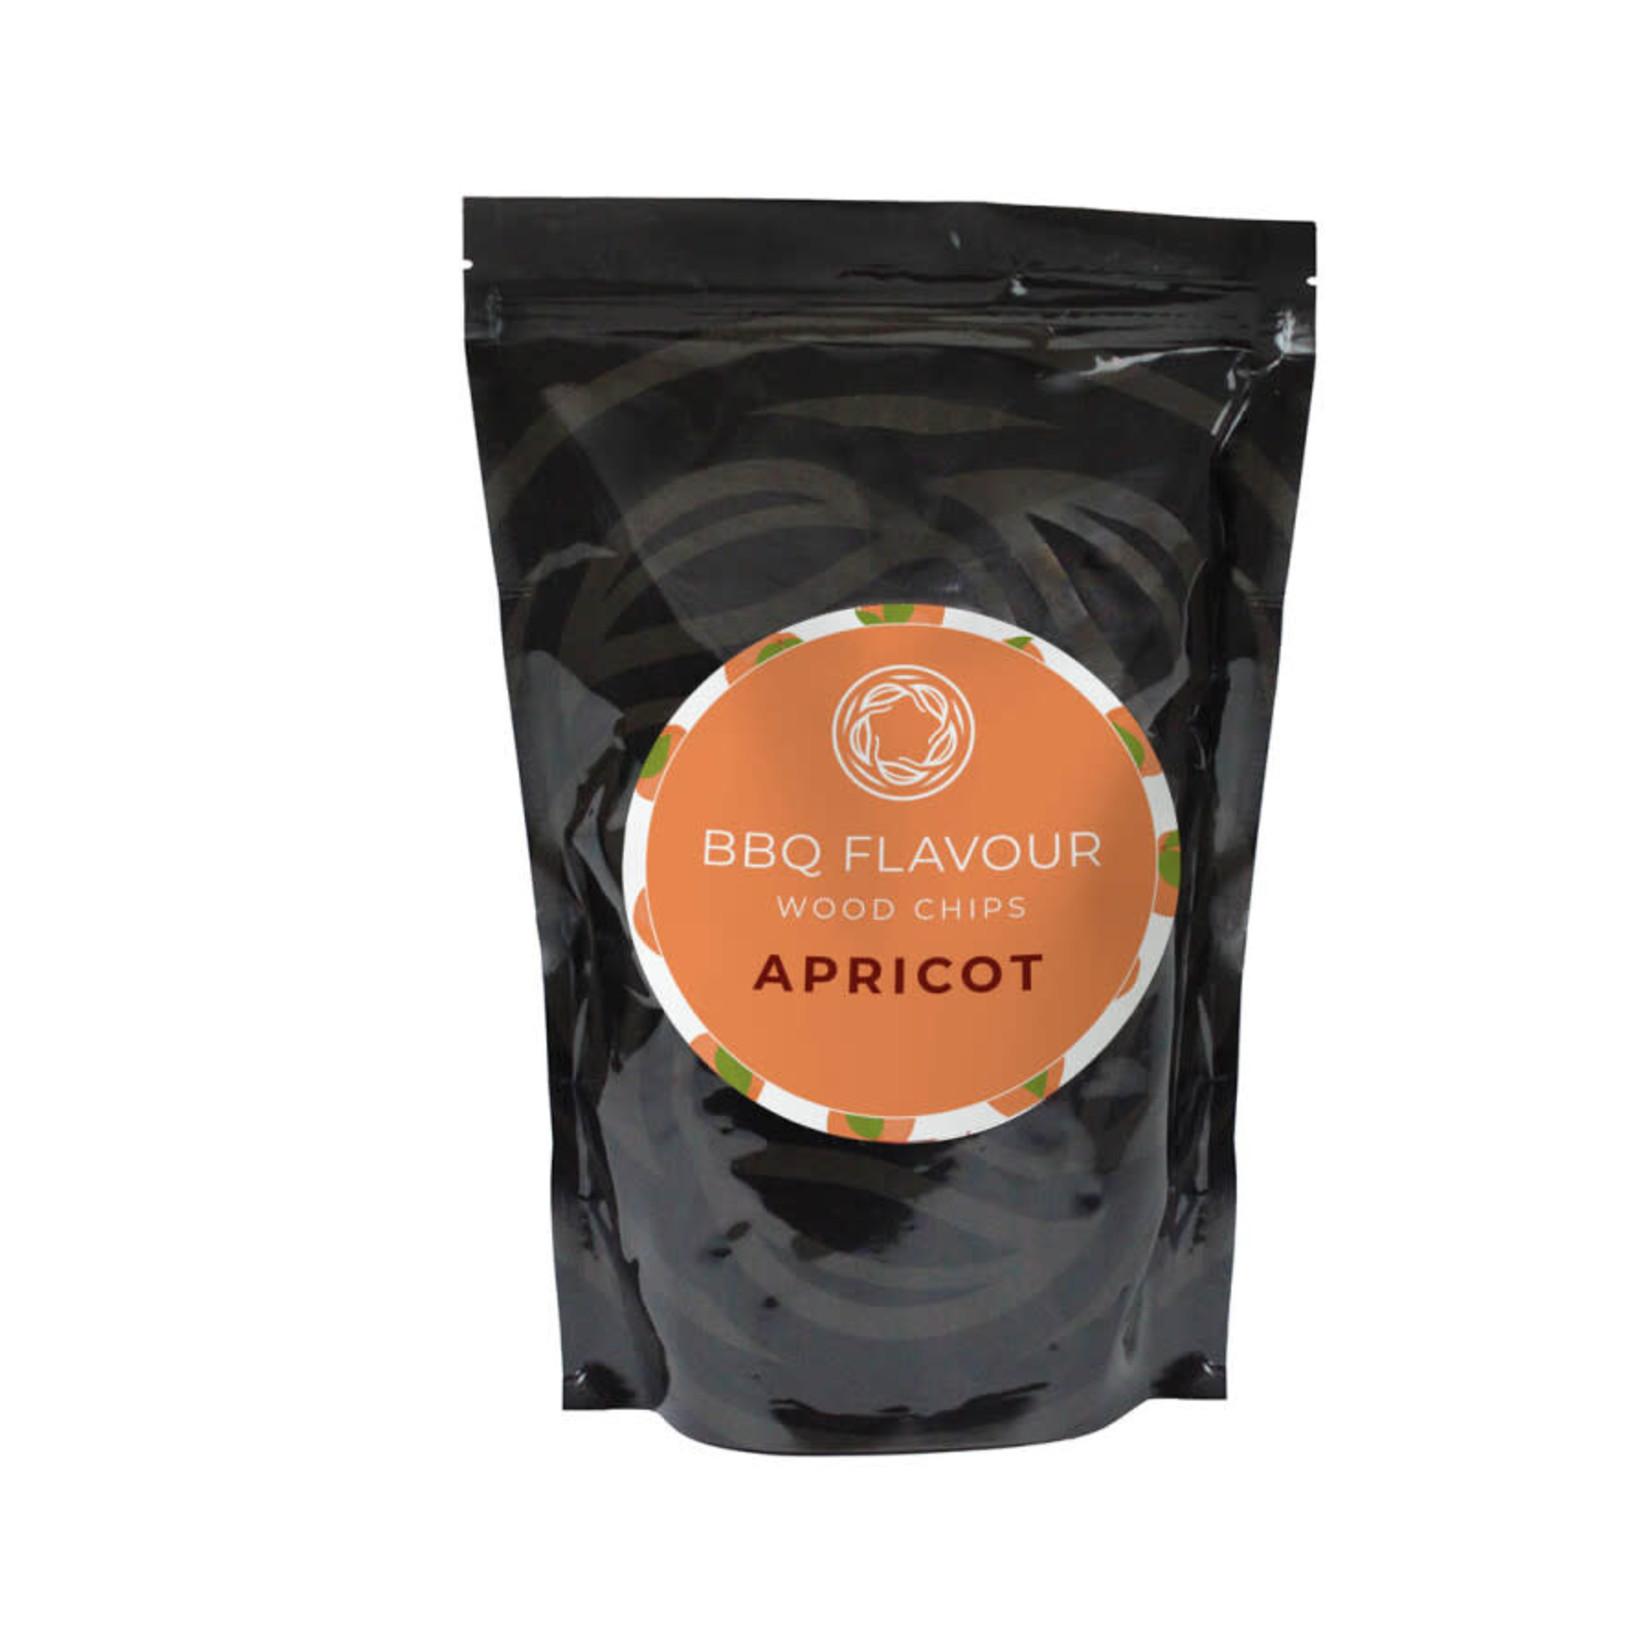 BBQ Flavour BBQ Flavour rookhout chips Apricot